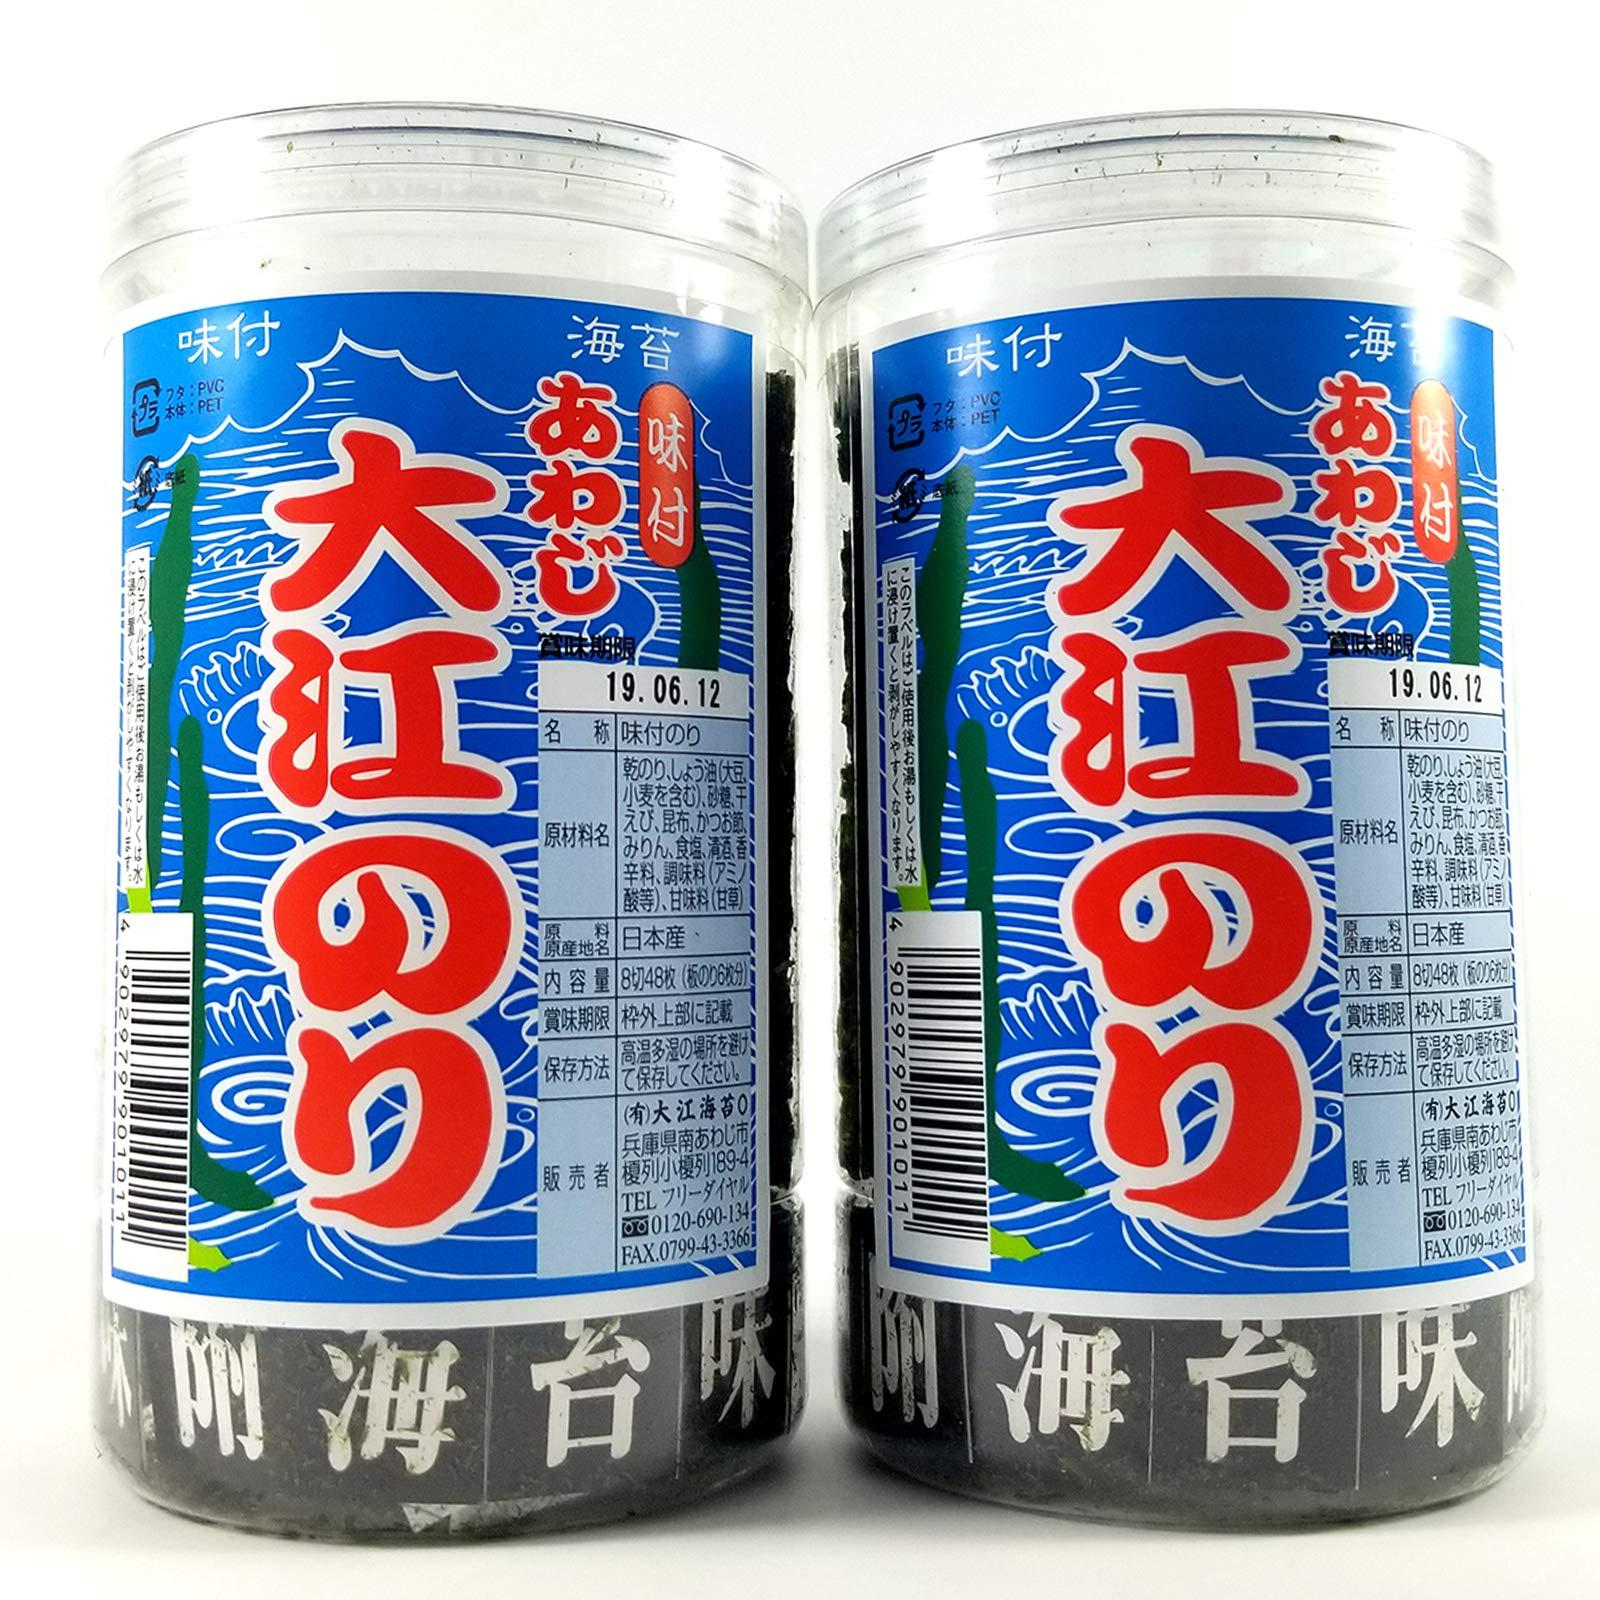 DOUNGURI Awaji Oe Nori - Organic Natural Gluten Free Seaweed Strip Sheets Snack Pack with Sea Salt and Kelp I 48 Counts I Crispy, Flavorful, Low Calorie, Healthy, Vegan, No MSG (2) by Dounguri (Image #2)